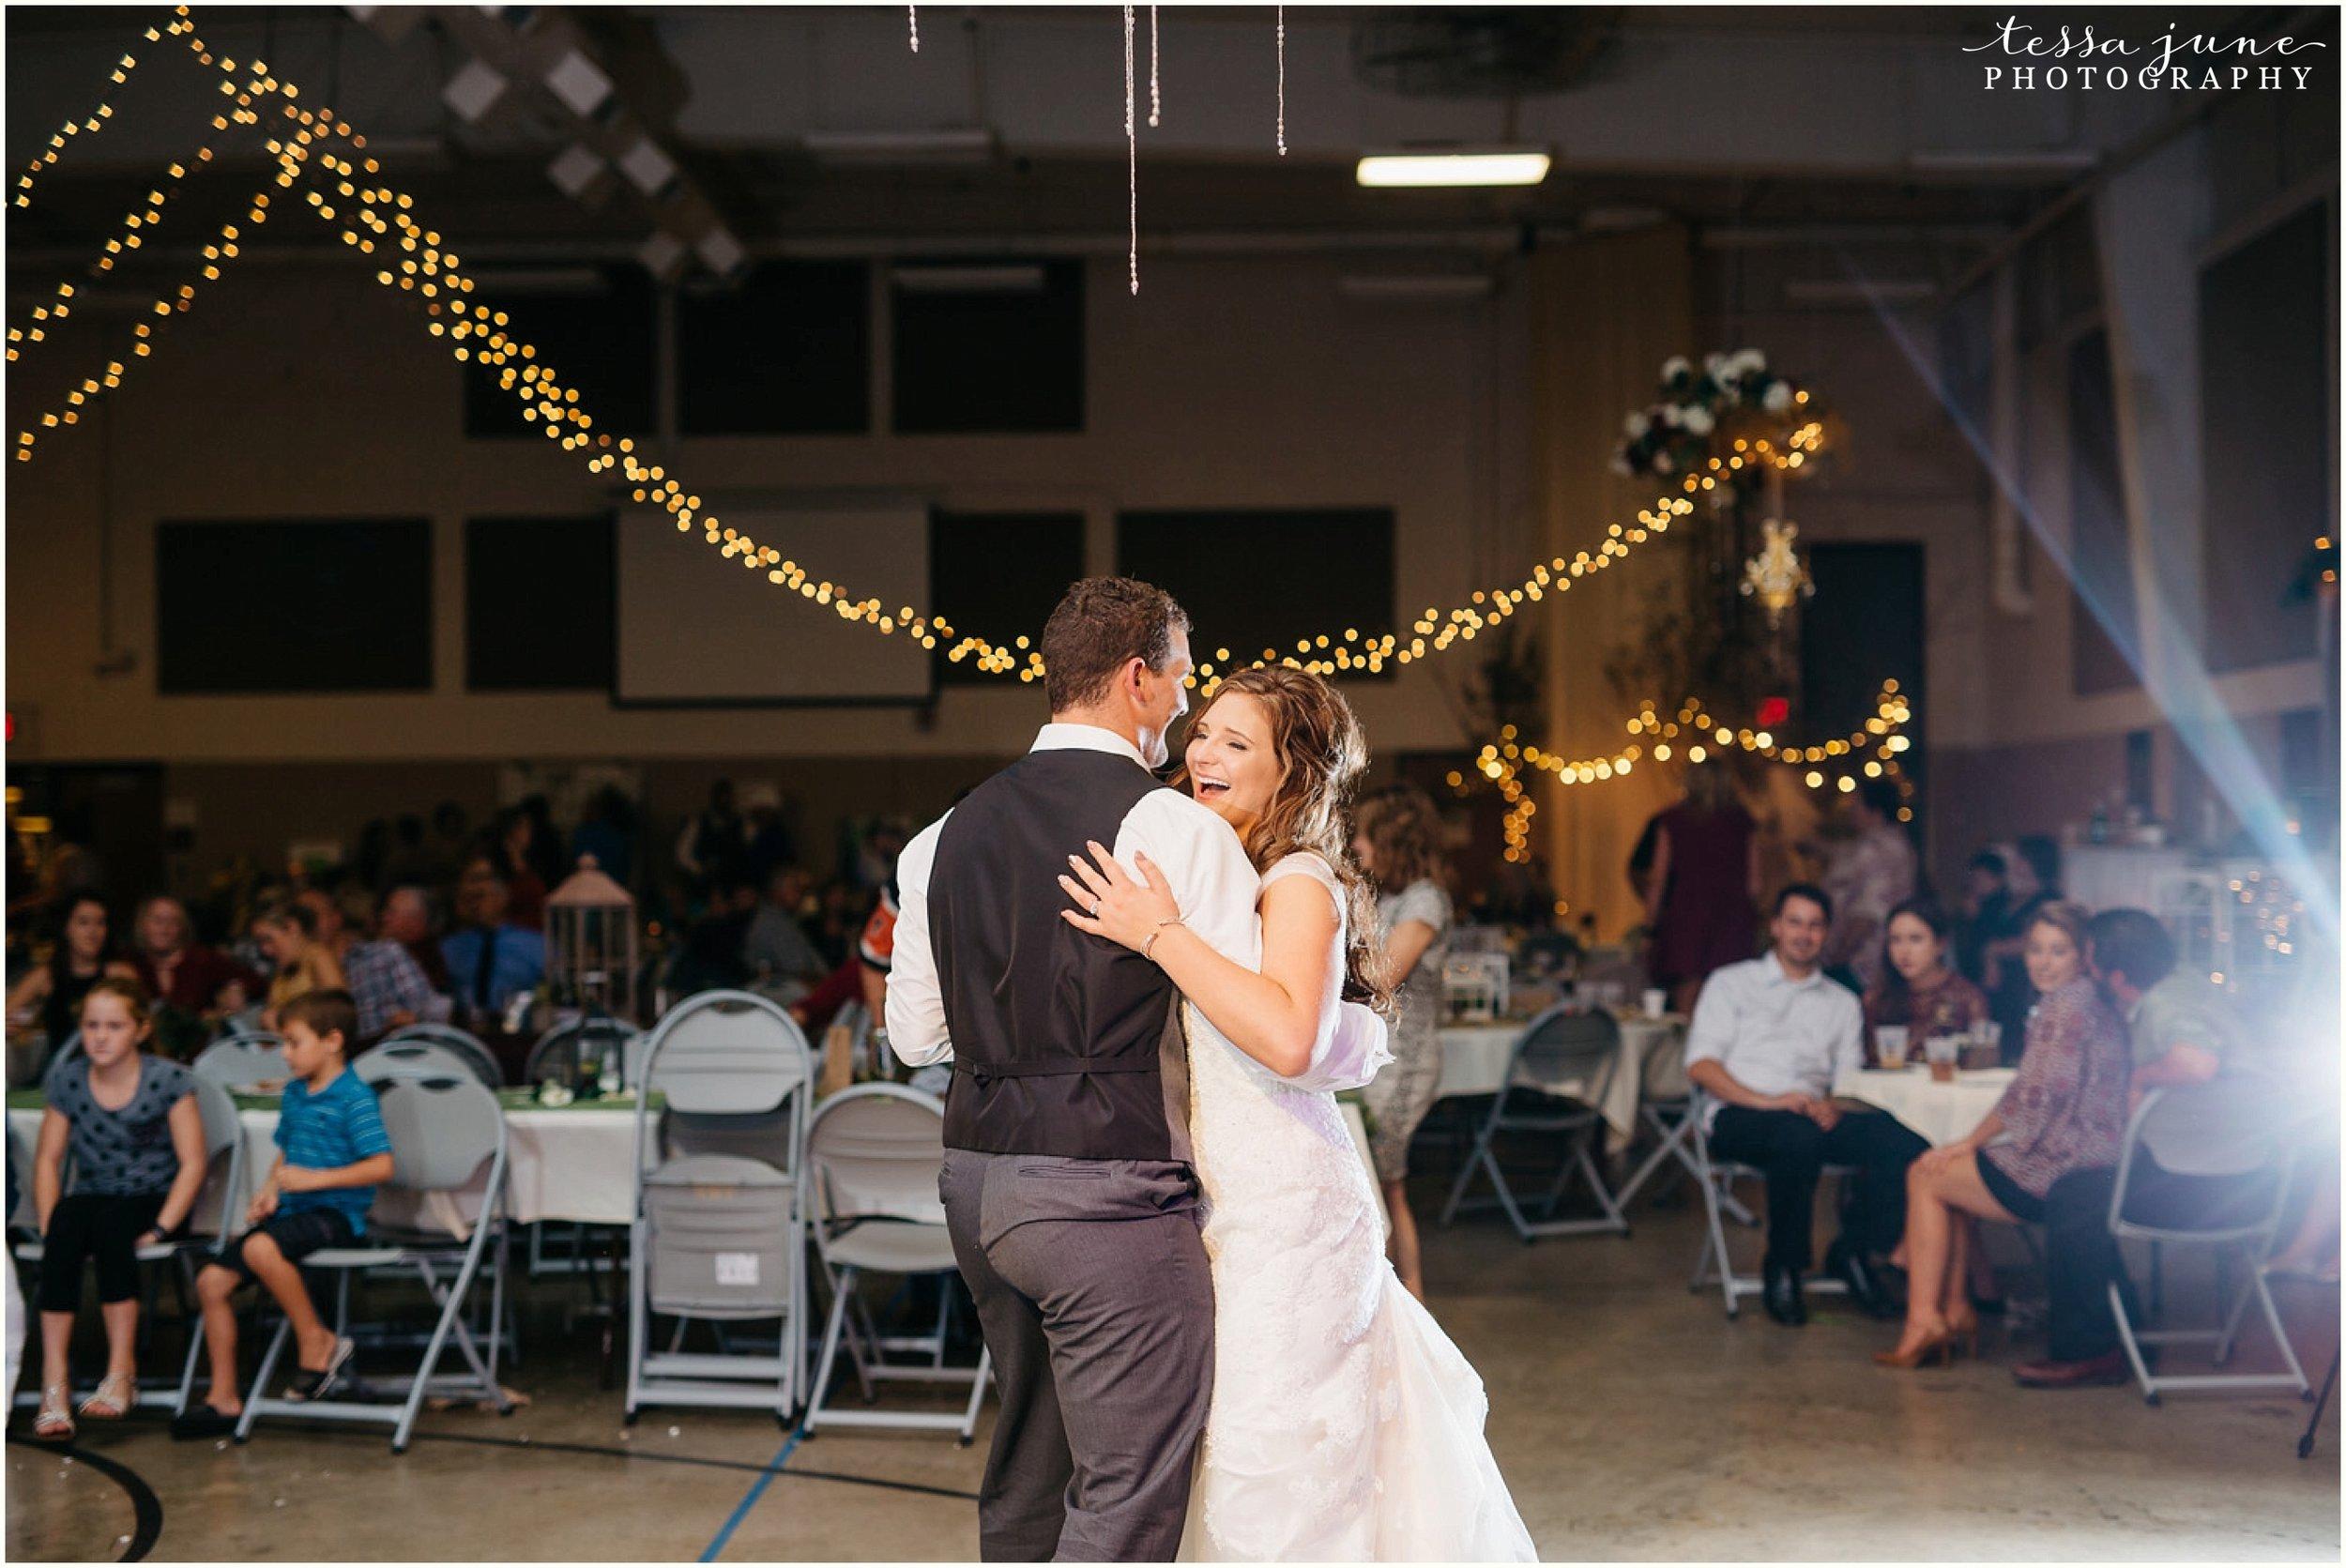 bohemian-minnesota-wedding-mismatched-bridesmaid-dresses-waterfall-st-cloud-tessa-june-photography-200.jpg